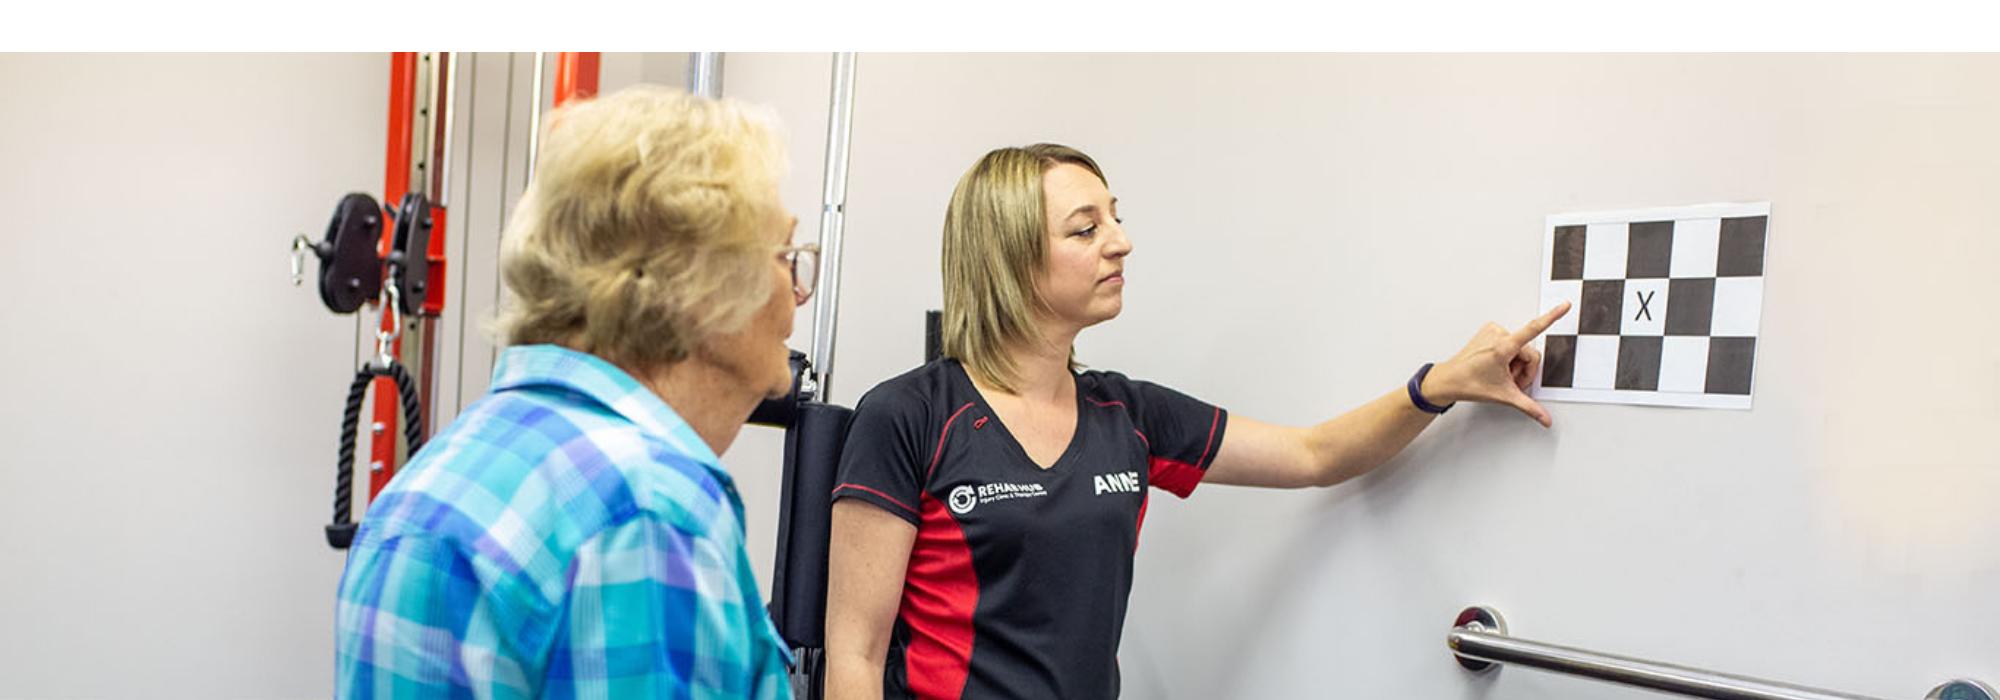 vestibular assessment with physio